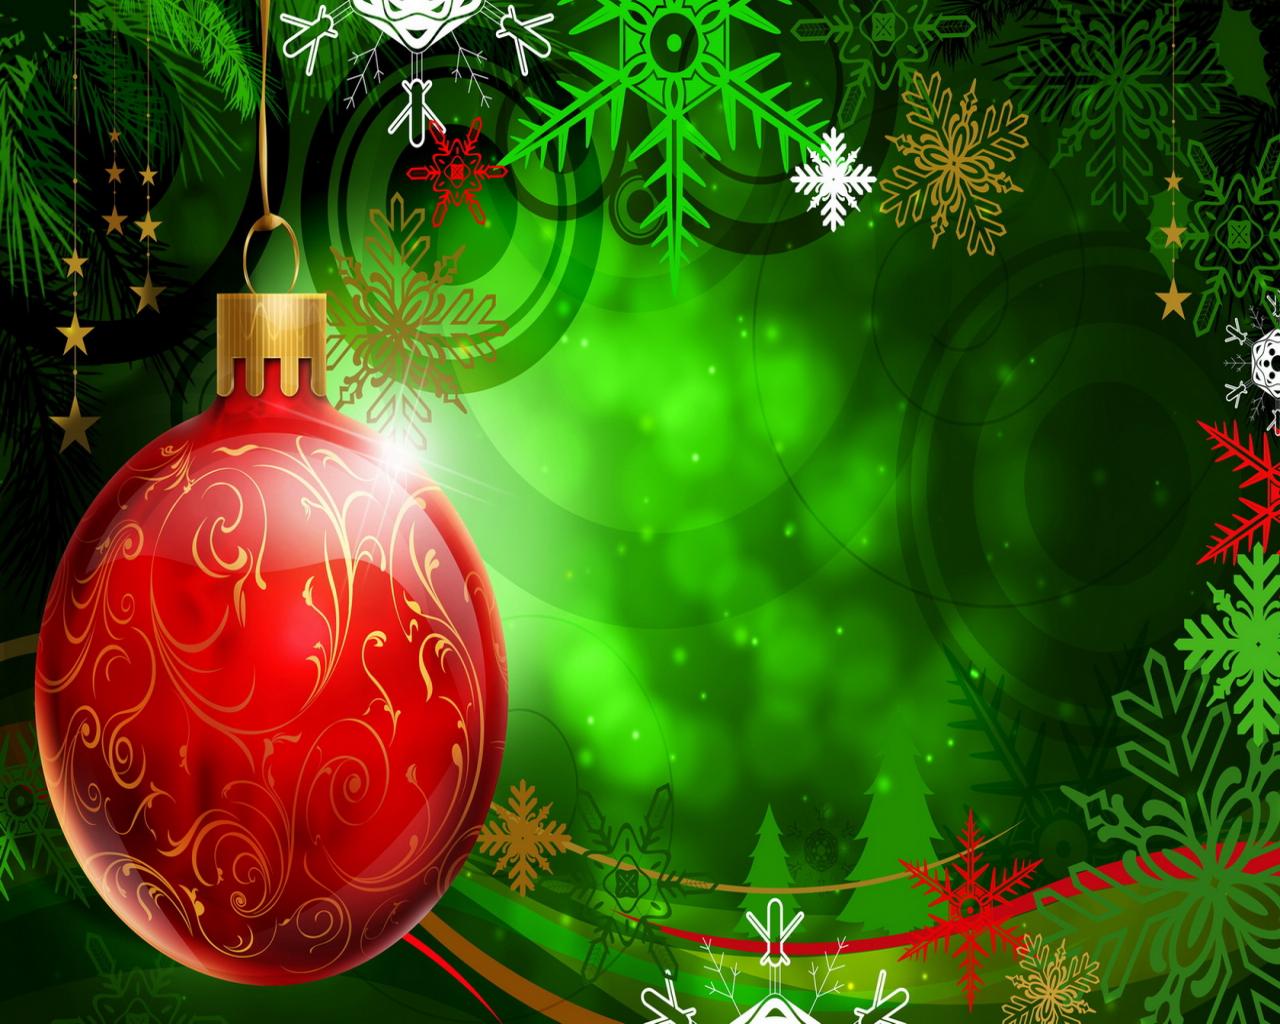 Live Christmas Desktop Wallpaper 1280x1024